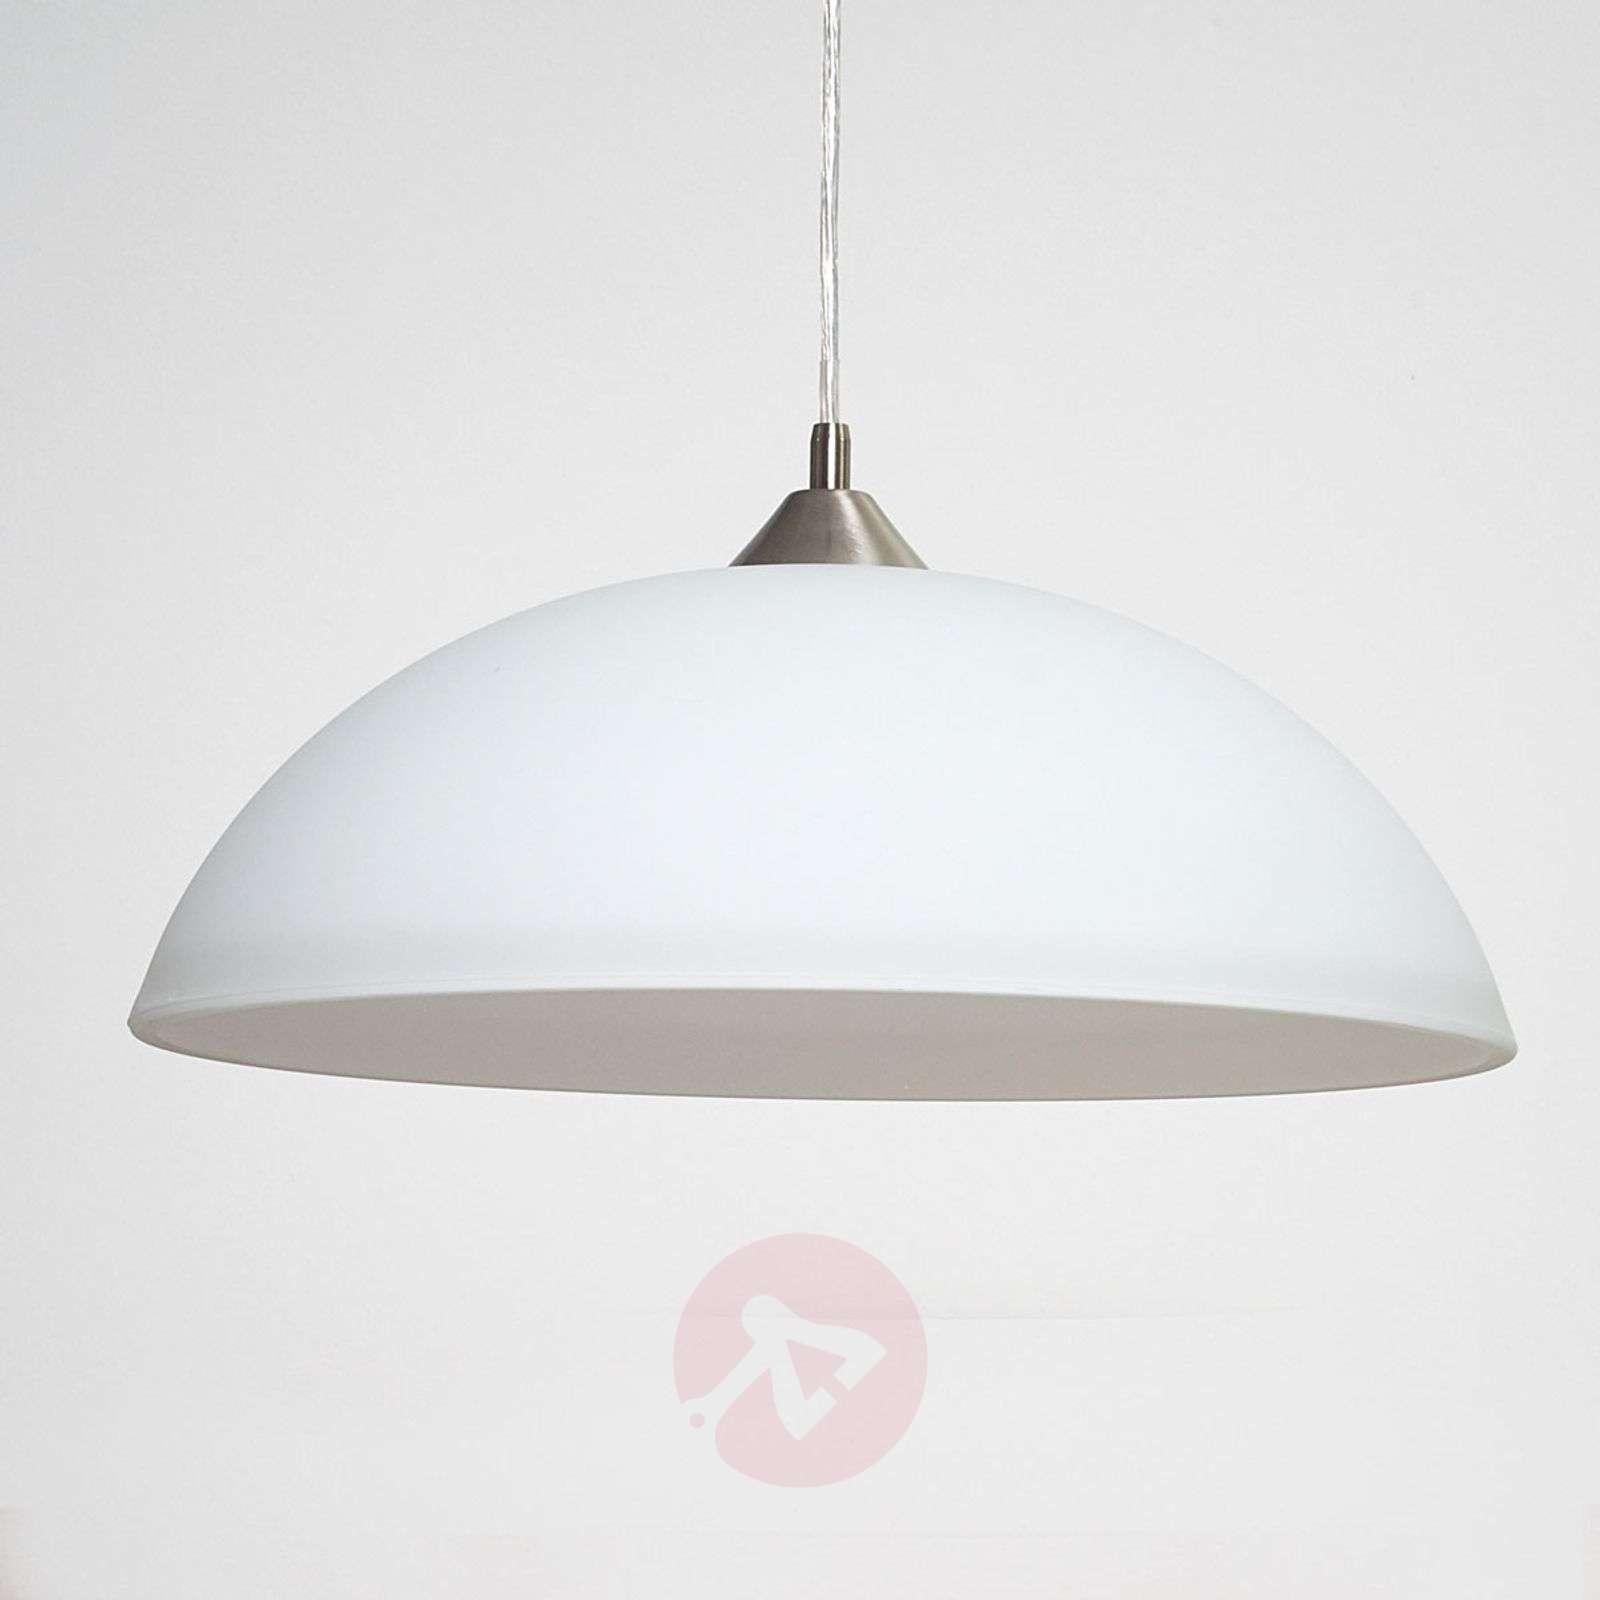 Kinga Hanging Light Classic Shape Nickel-7253786-02